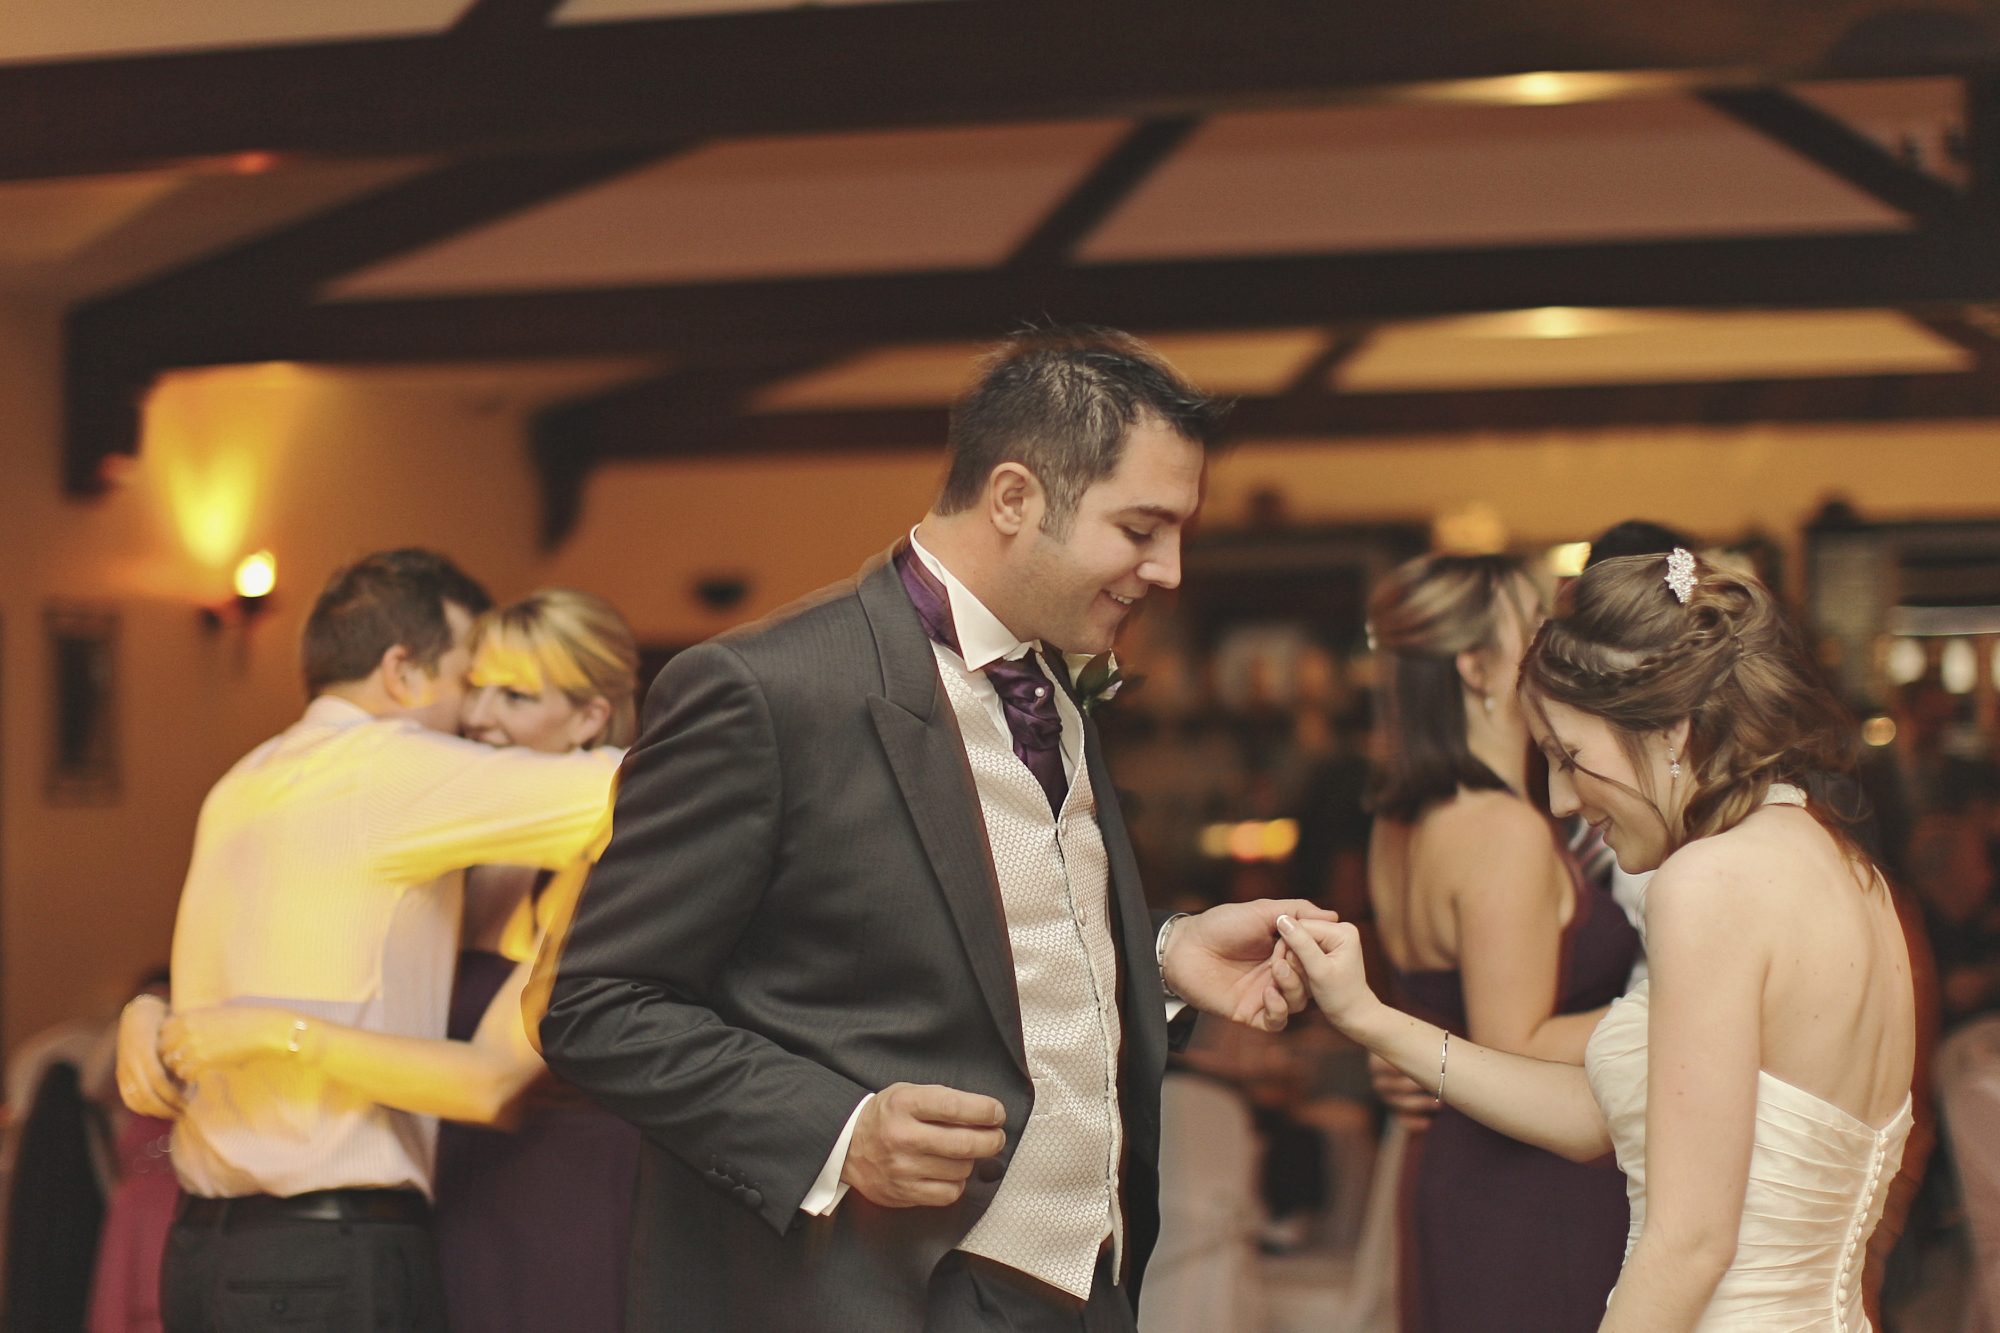 Weddings at Dovecote